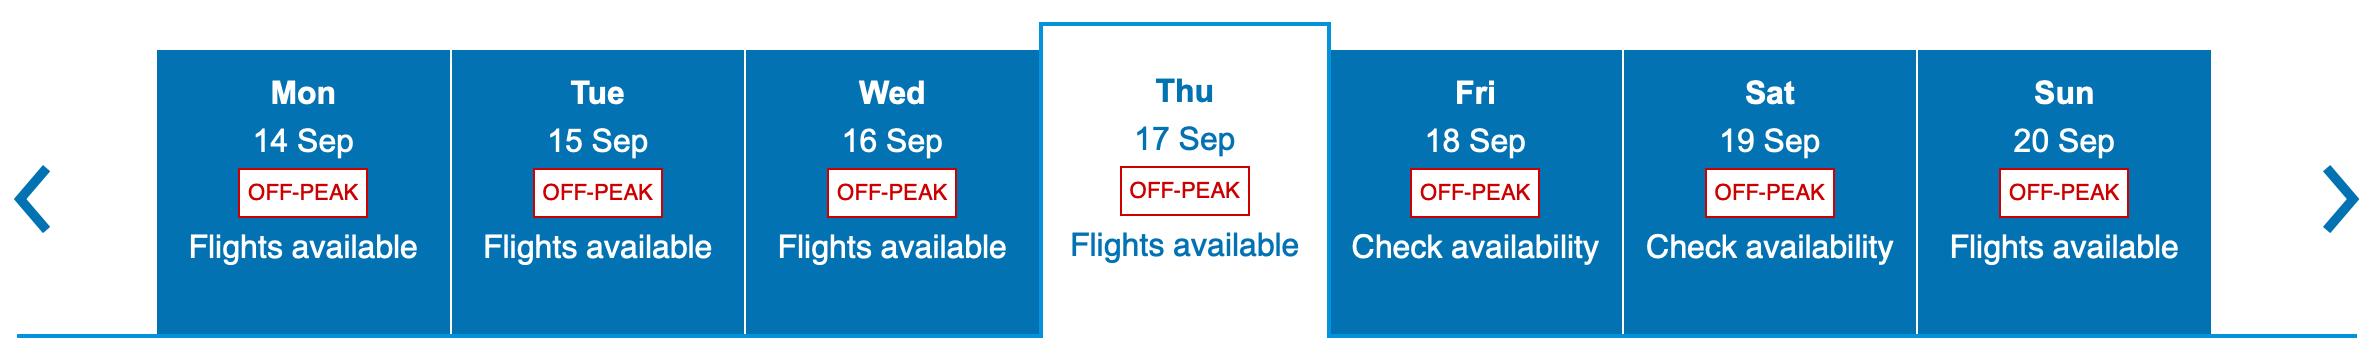 Viewing Peak and Off Peak Dates on BA Website Screen Shot